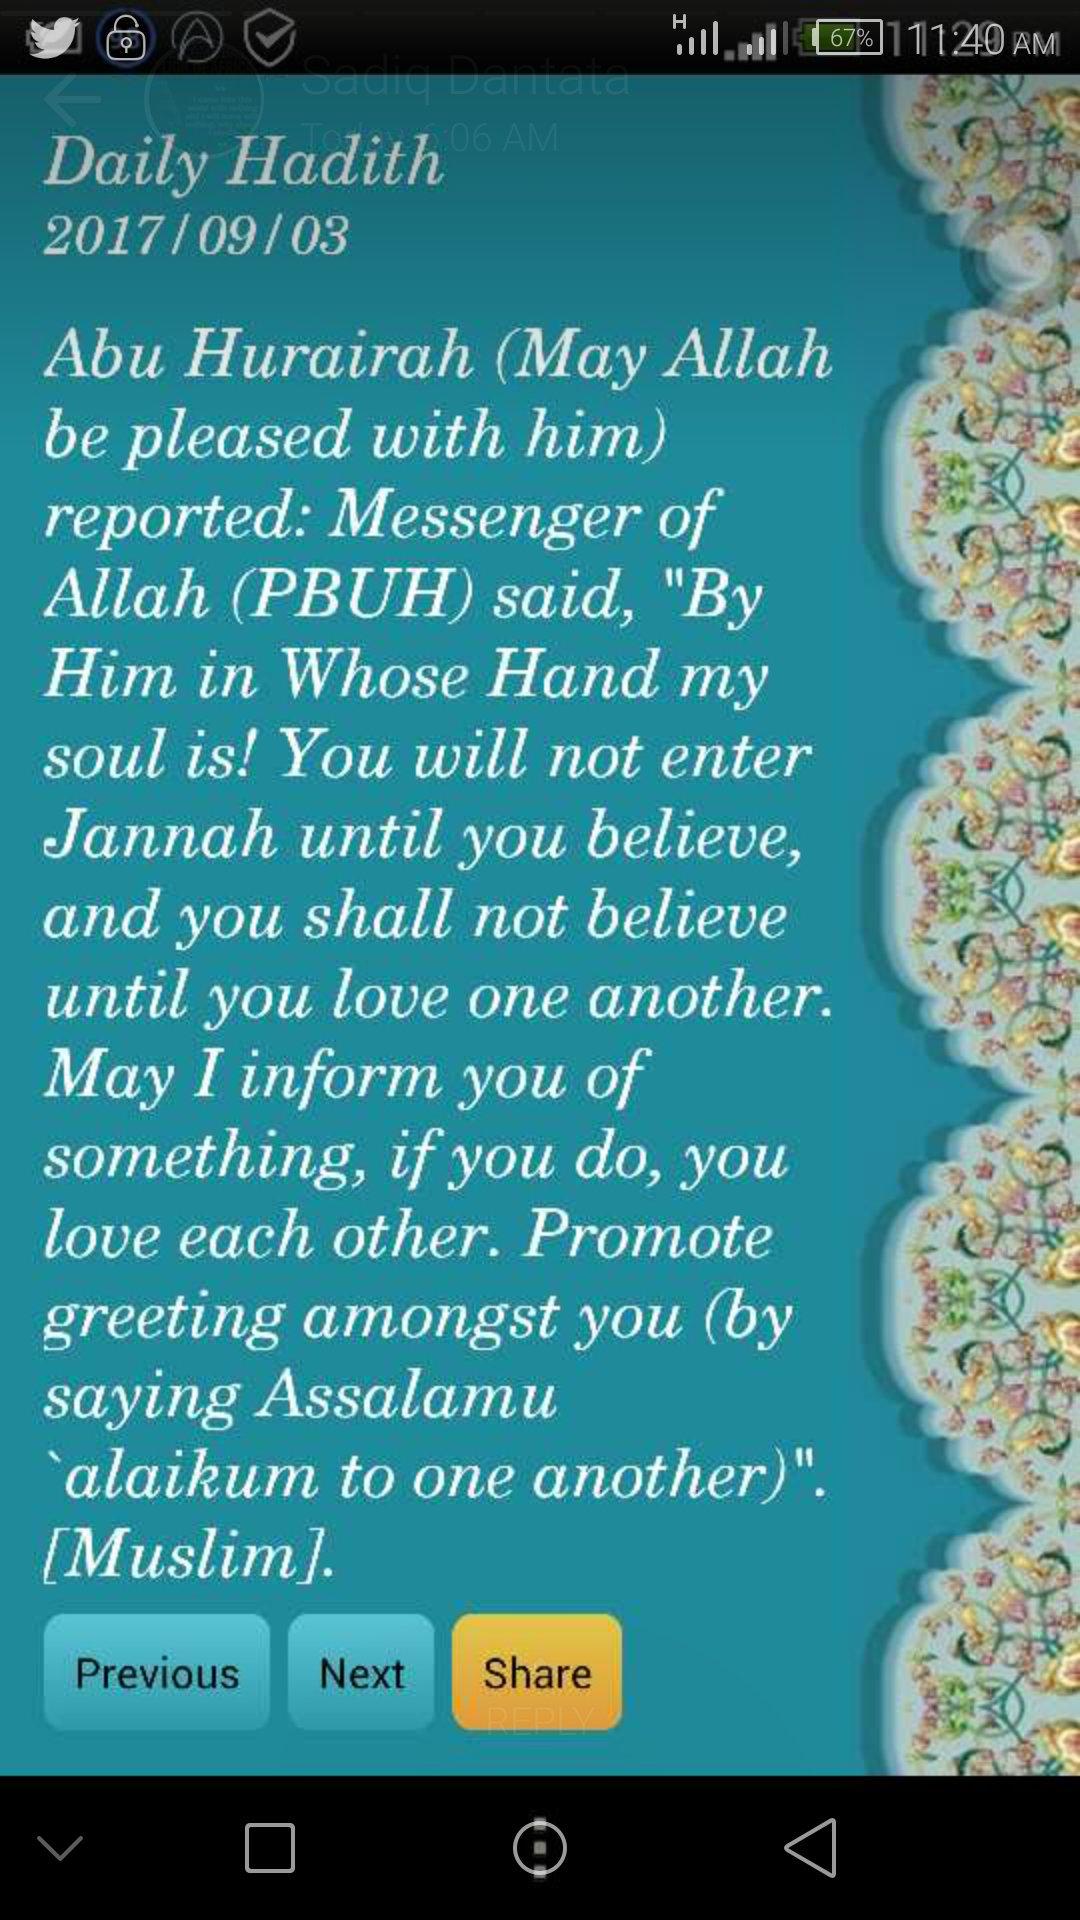 S Umar On Twitter Hadithoftheday Assalamu Alaikum Wa Rahmatullah